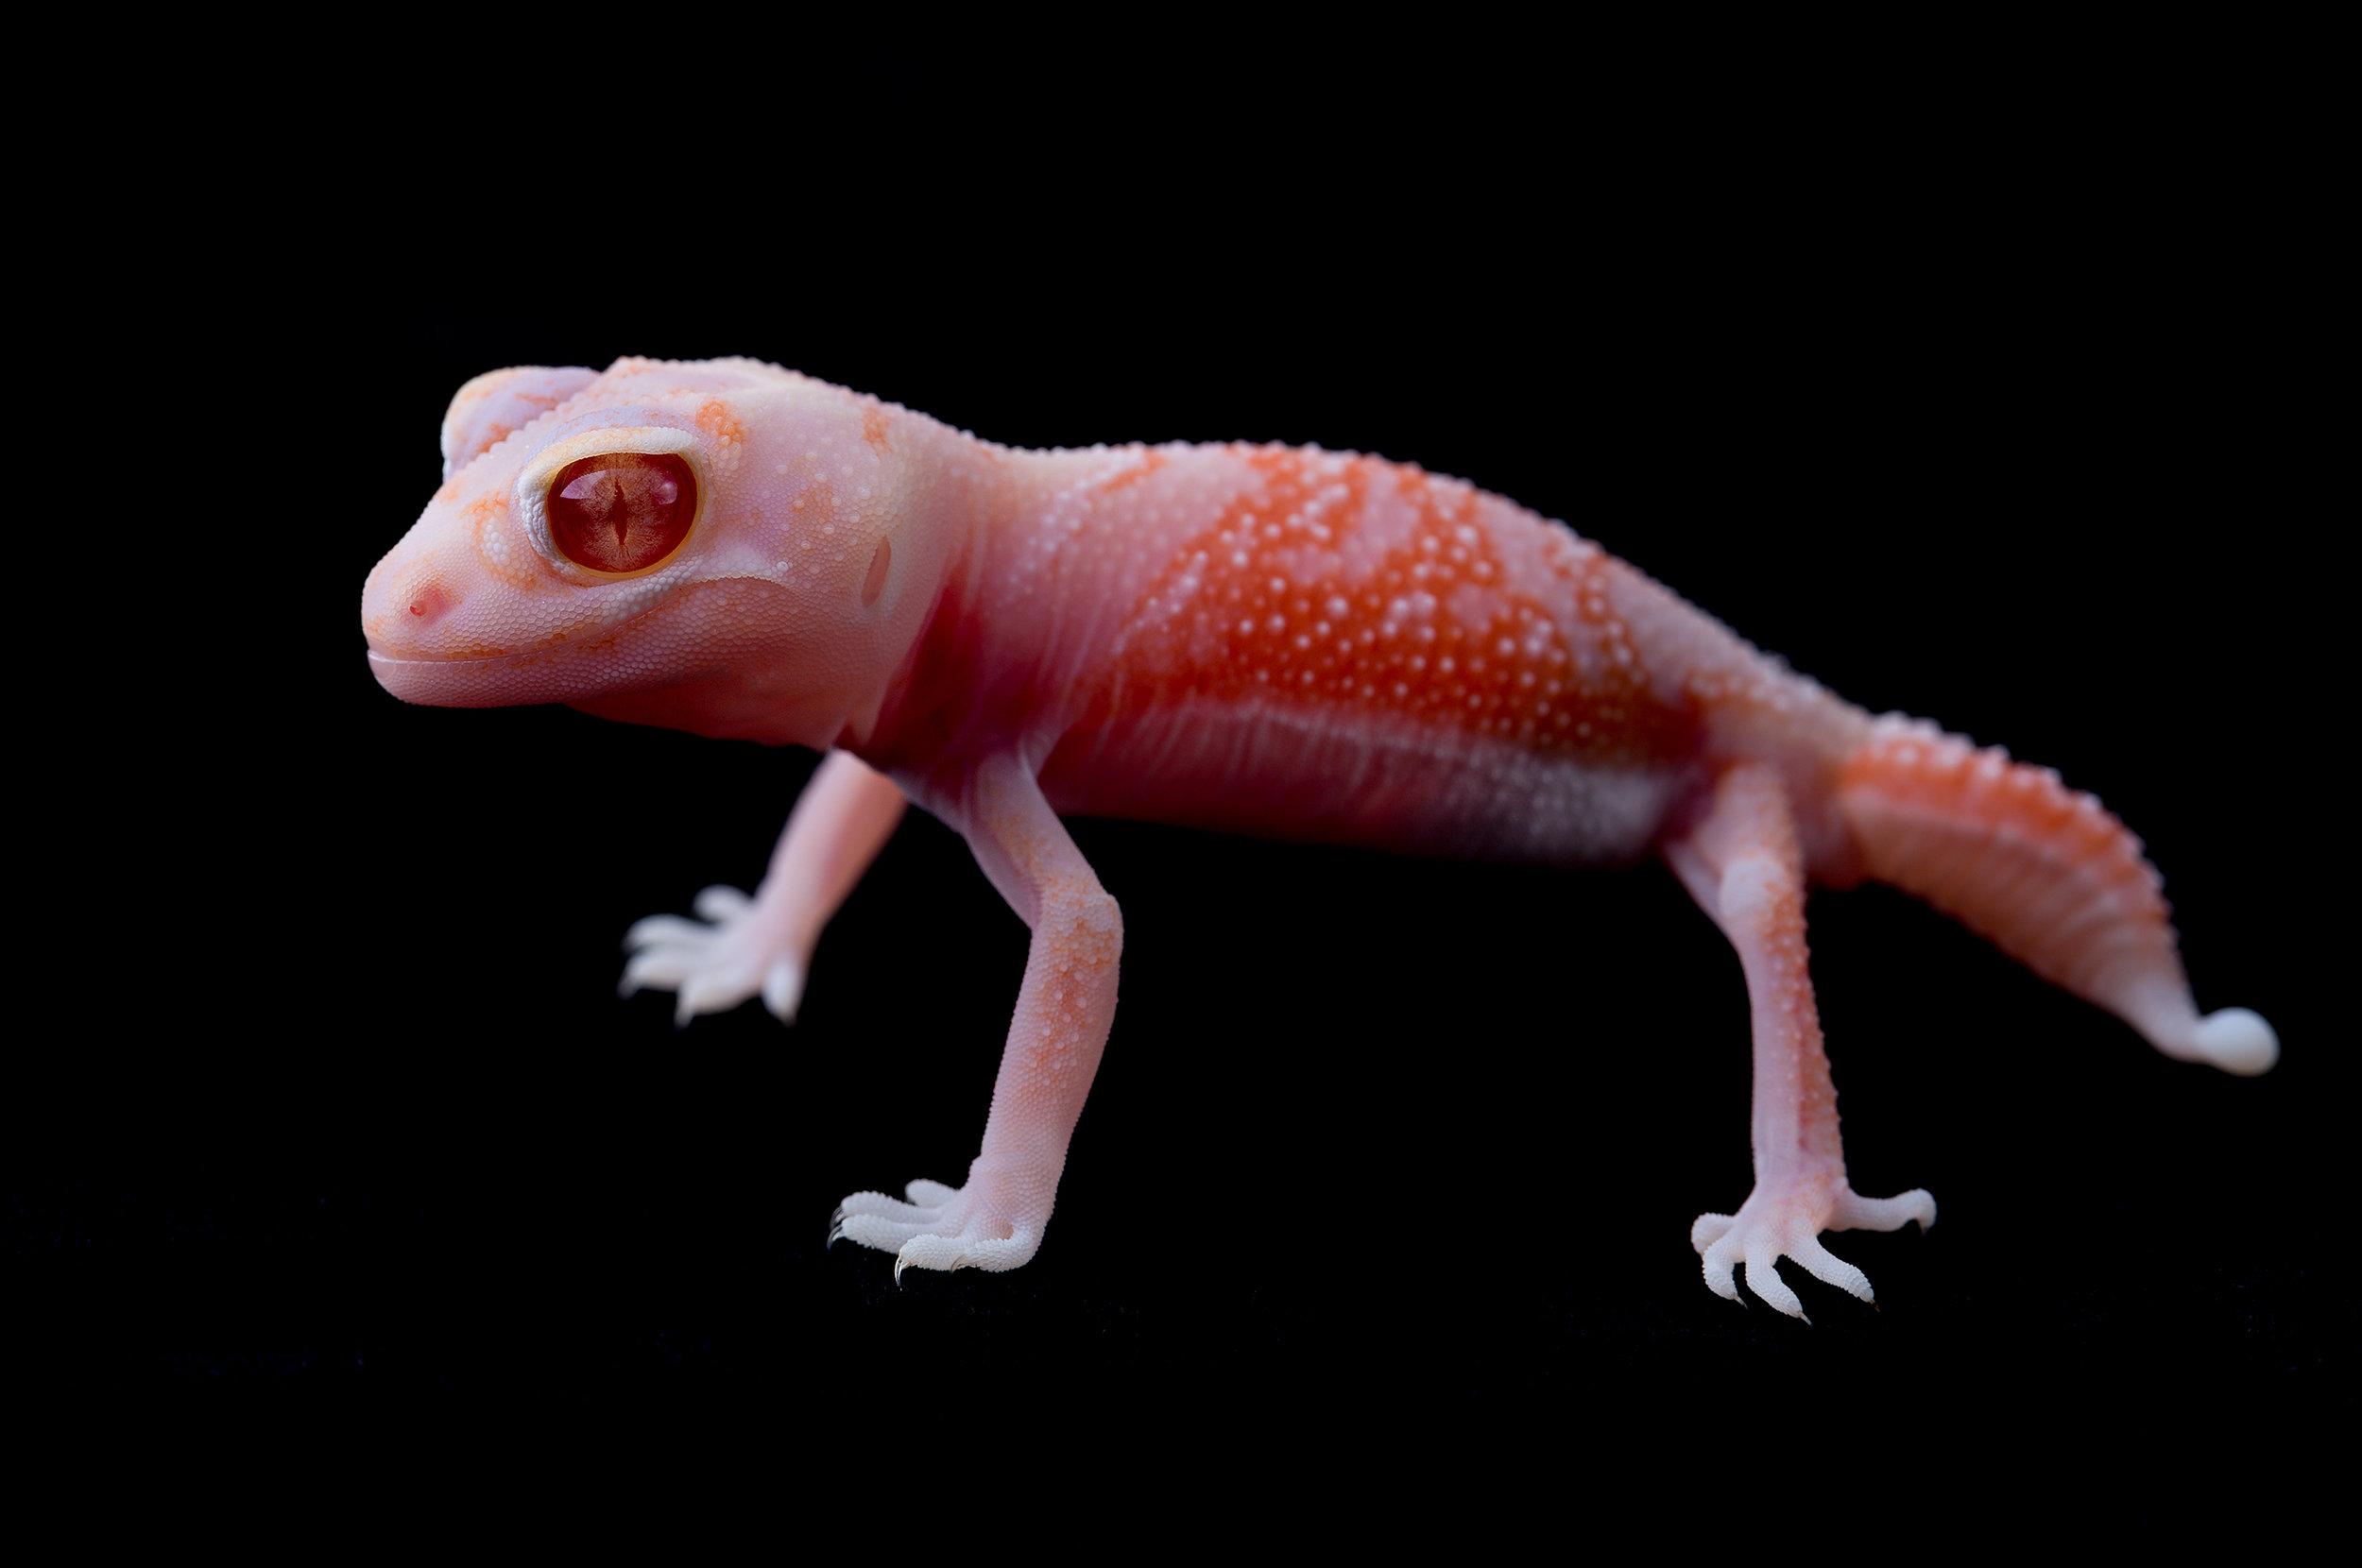 Hatchling albino